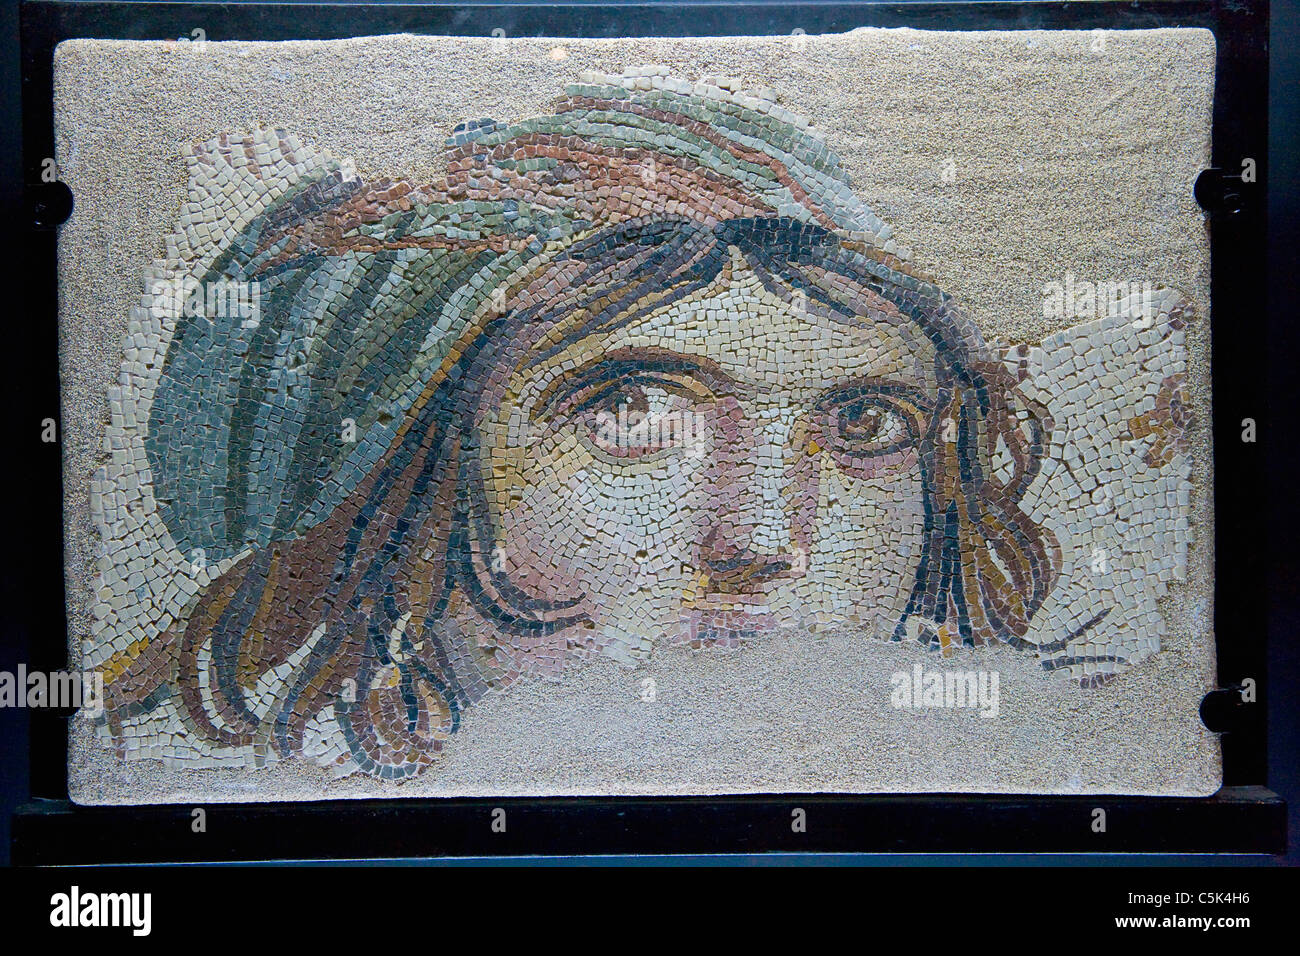 Maenad (or Gypsy Girl) Mosaic at Gaziantep Archaeology Museum, Gaziantep (Antep), Turkey Stock Photo